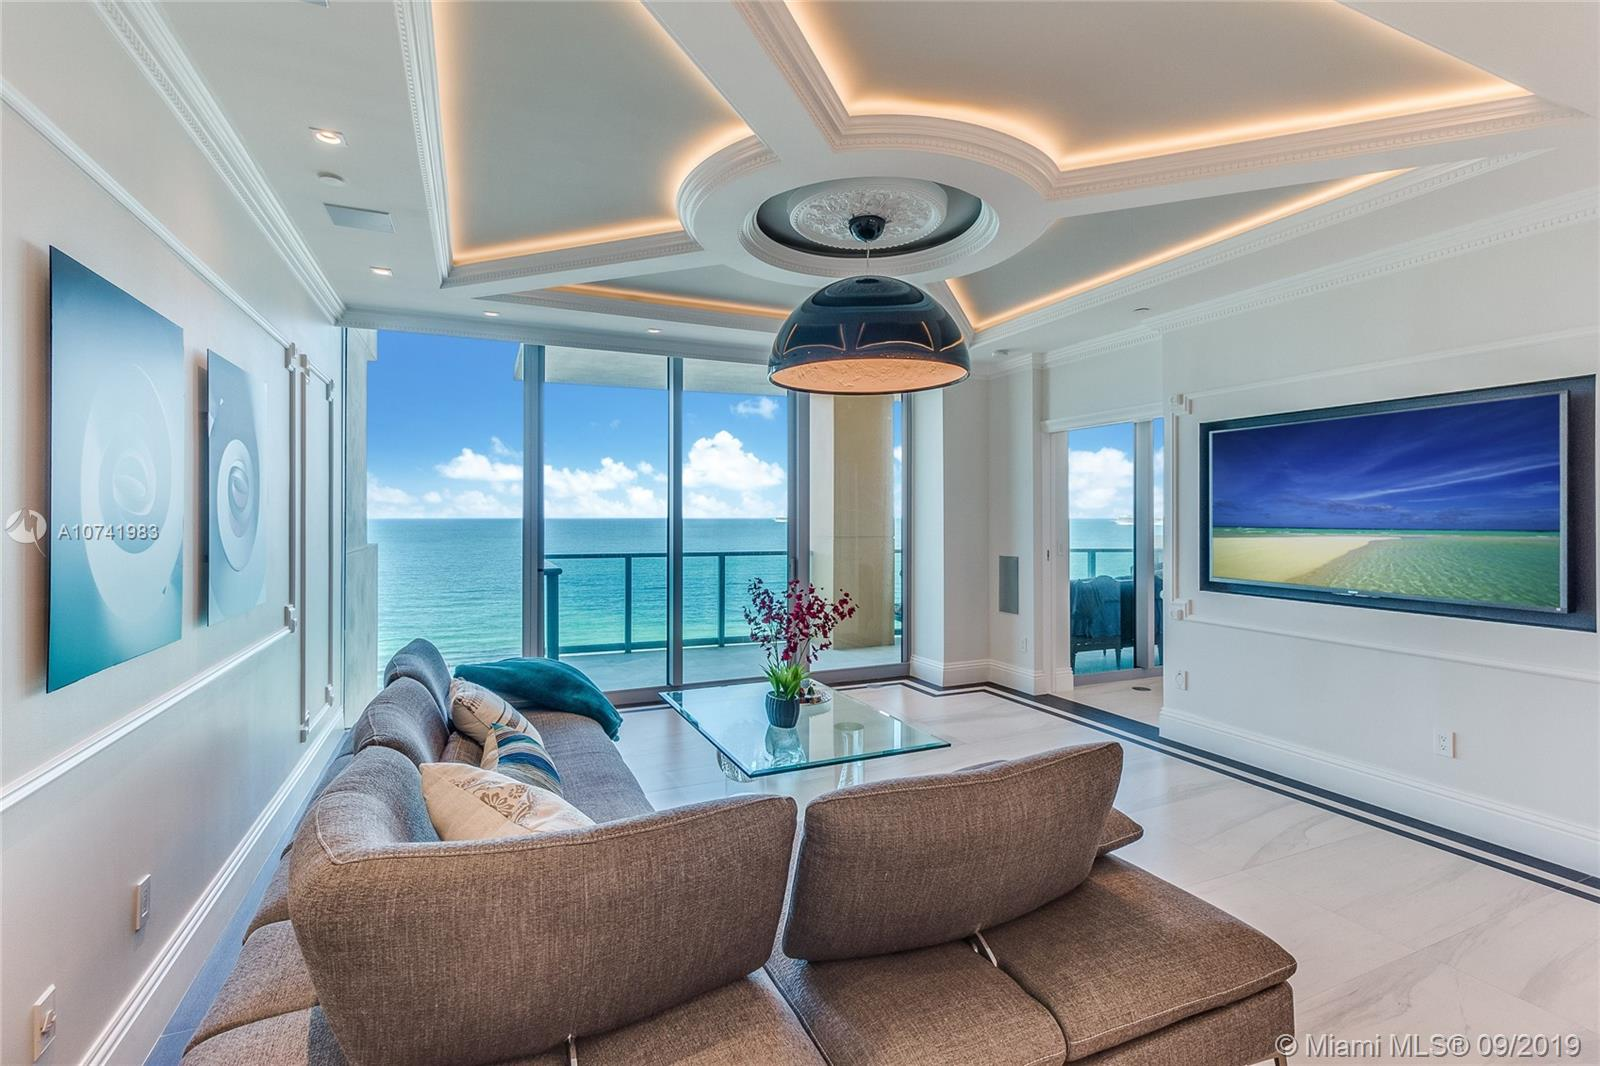 1455 Ocean Dr # 1607, Miami Beach, Florida 33139, 3 Bedrooms Bedrooms, ,4 BathroomsBathrooms,Residential,For Sale,1455 Ocean Dr # 1607,A10741983